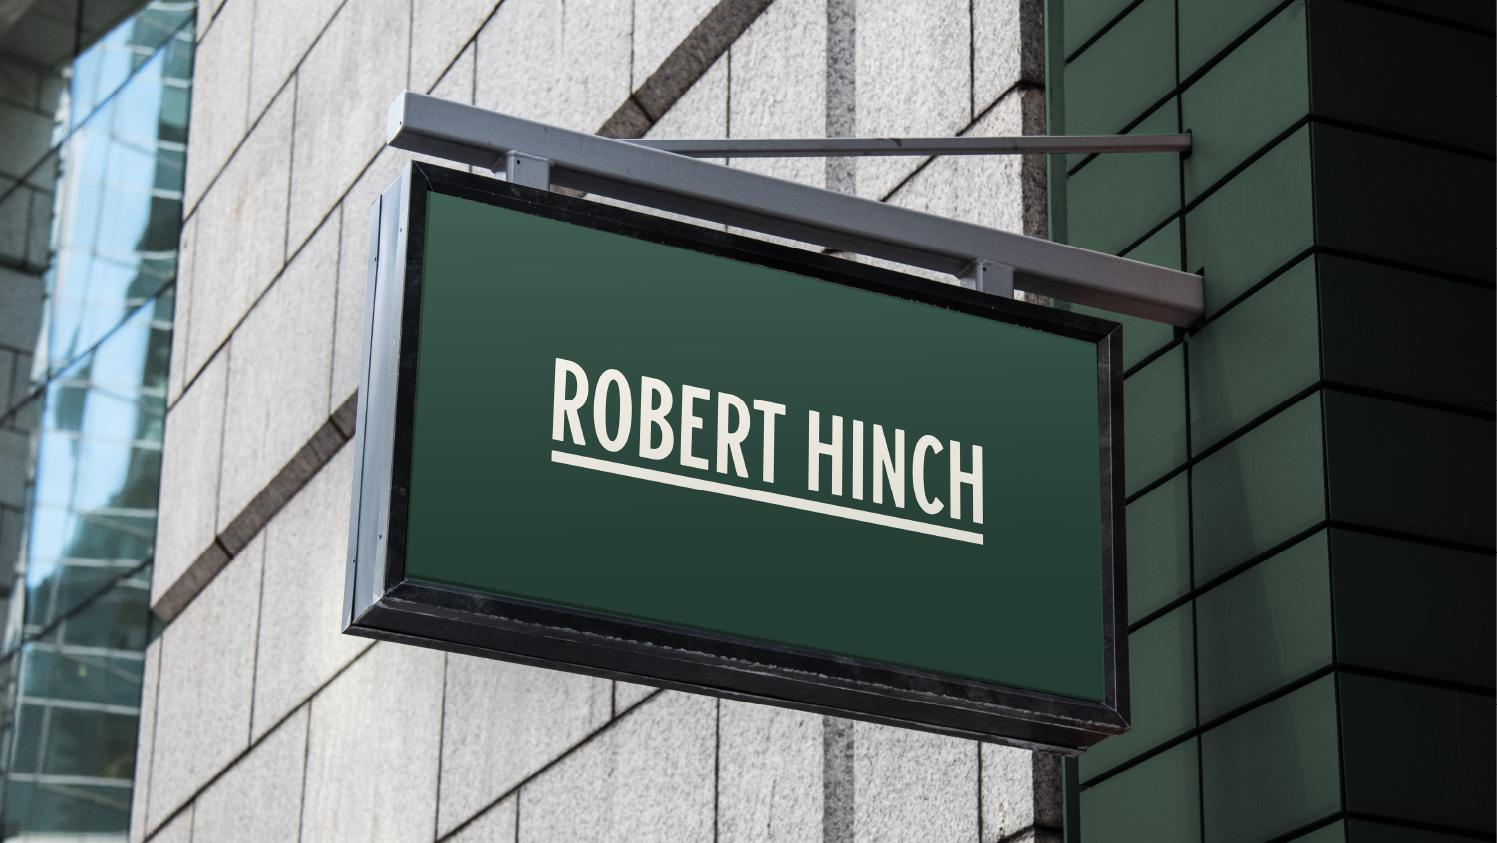 Robert Hinch Barber Shop Branding by Stamp Works